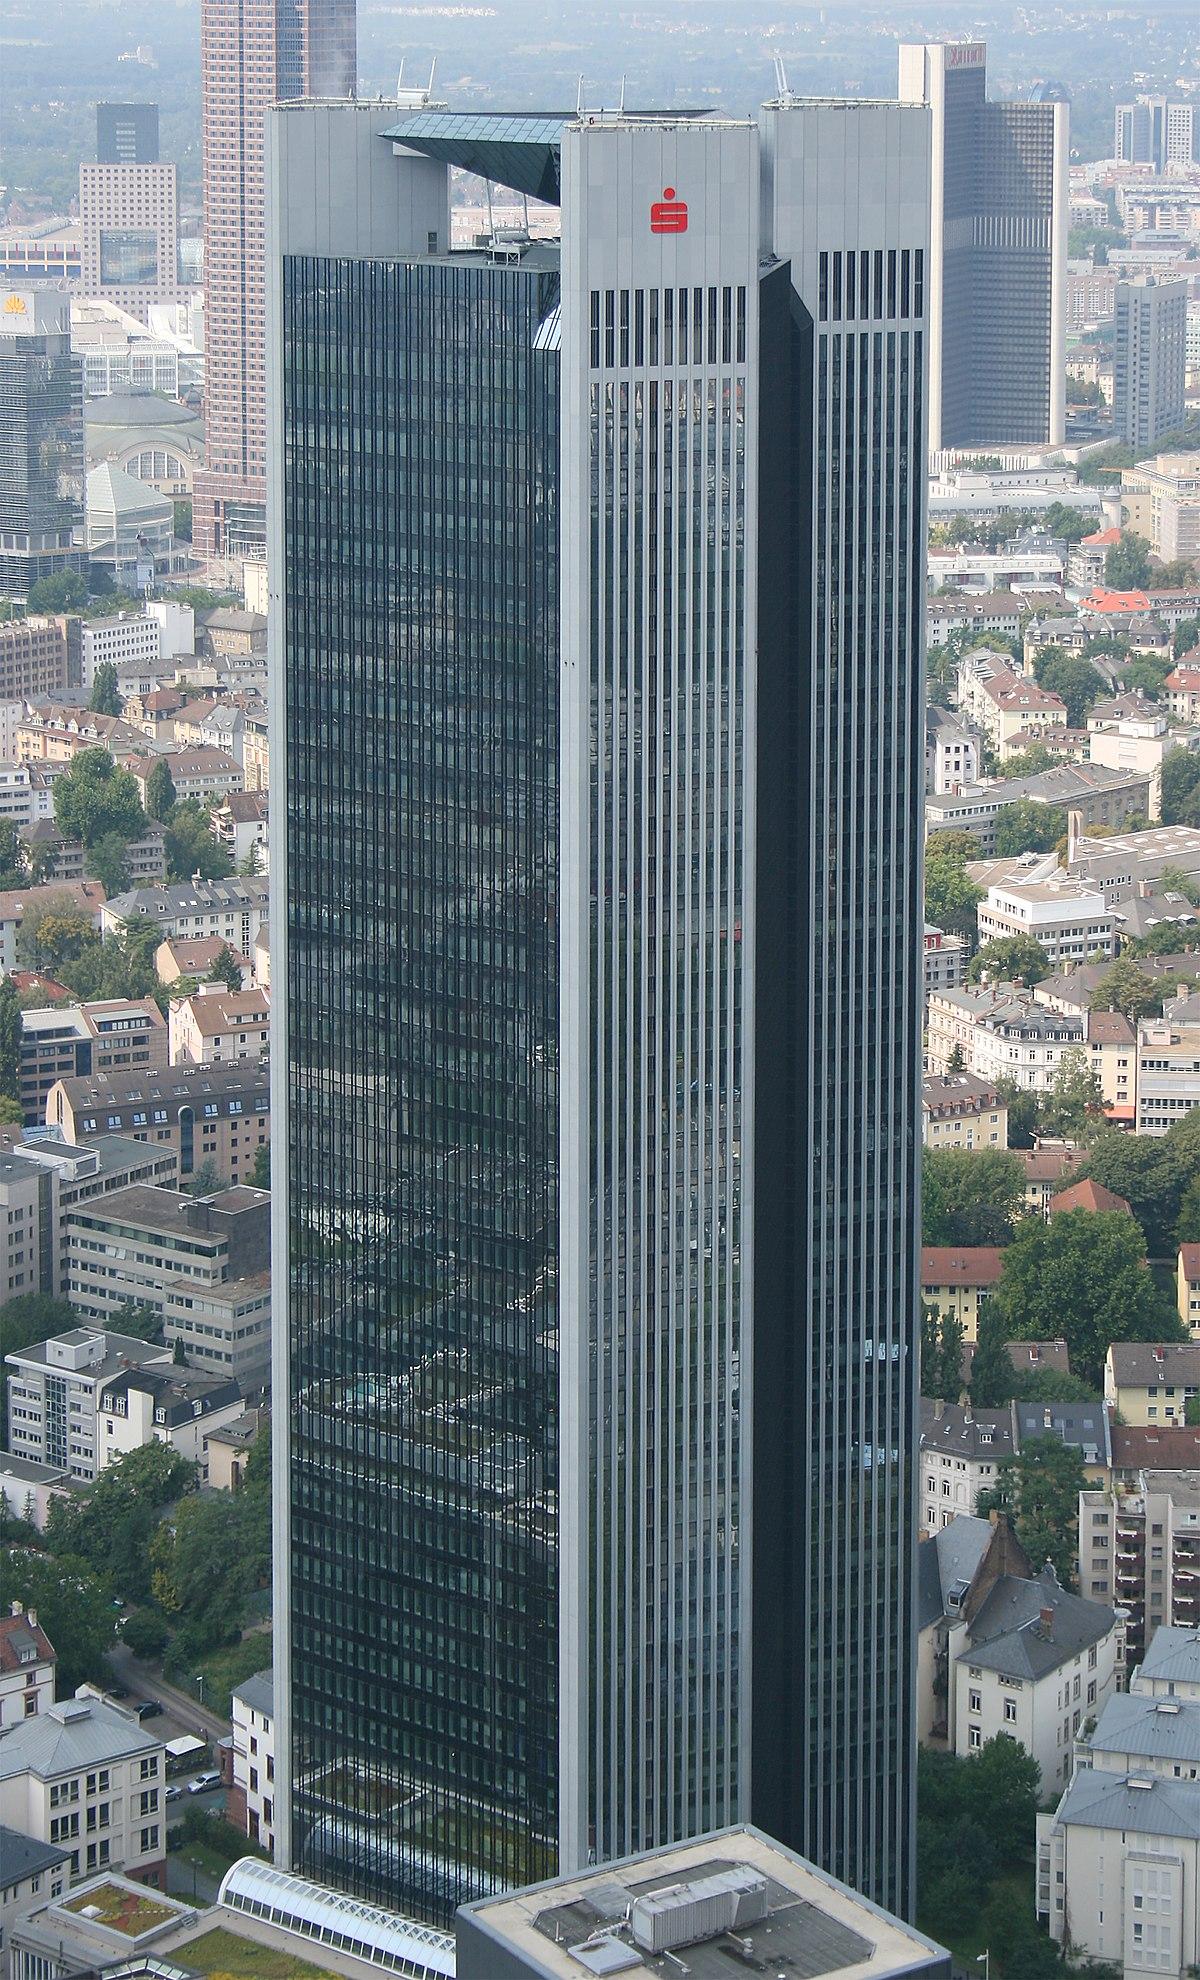 Berlin Wallpaper Hd Dekabank Deutsche Girozentrale Wikipedia